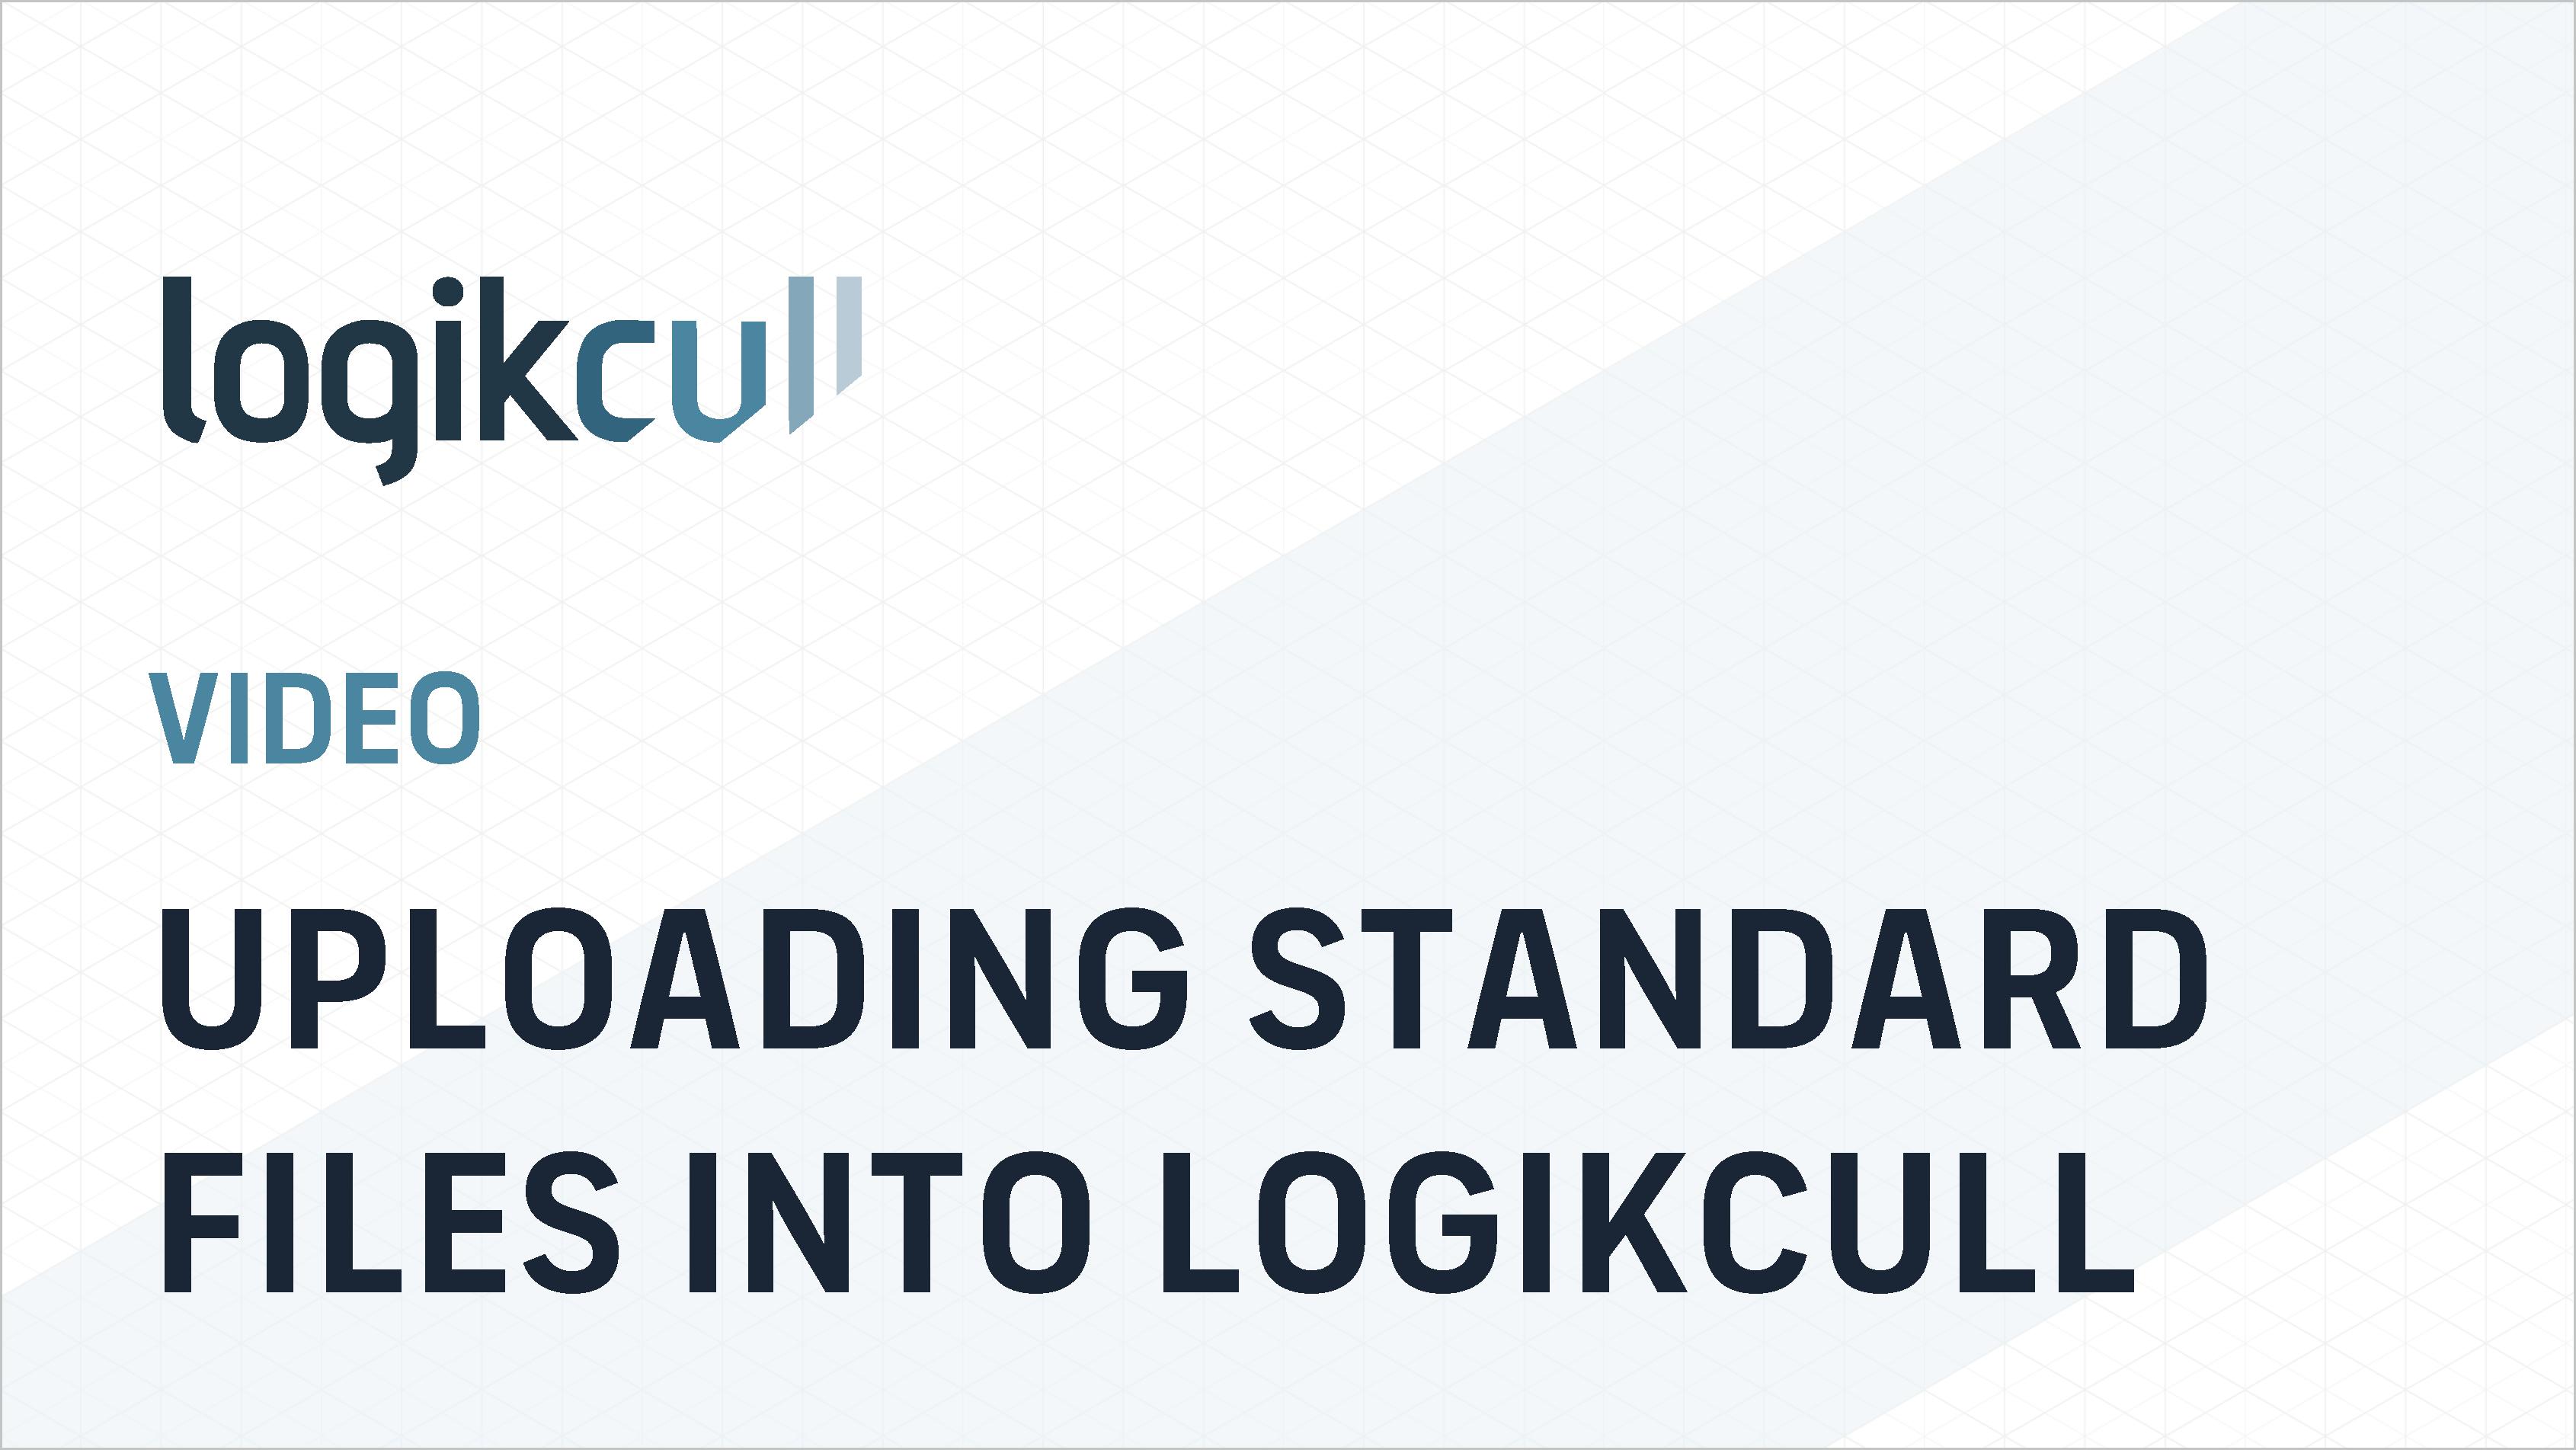 Uploading standard files into Logikcull